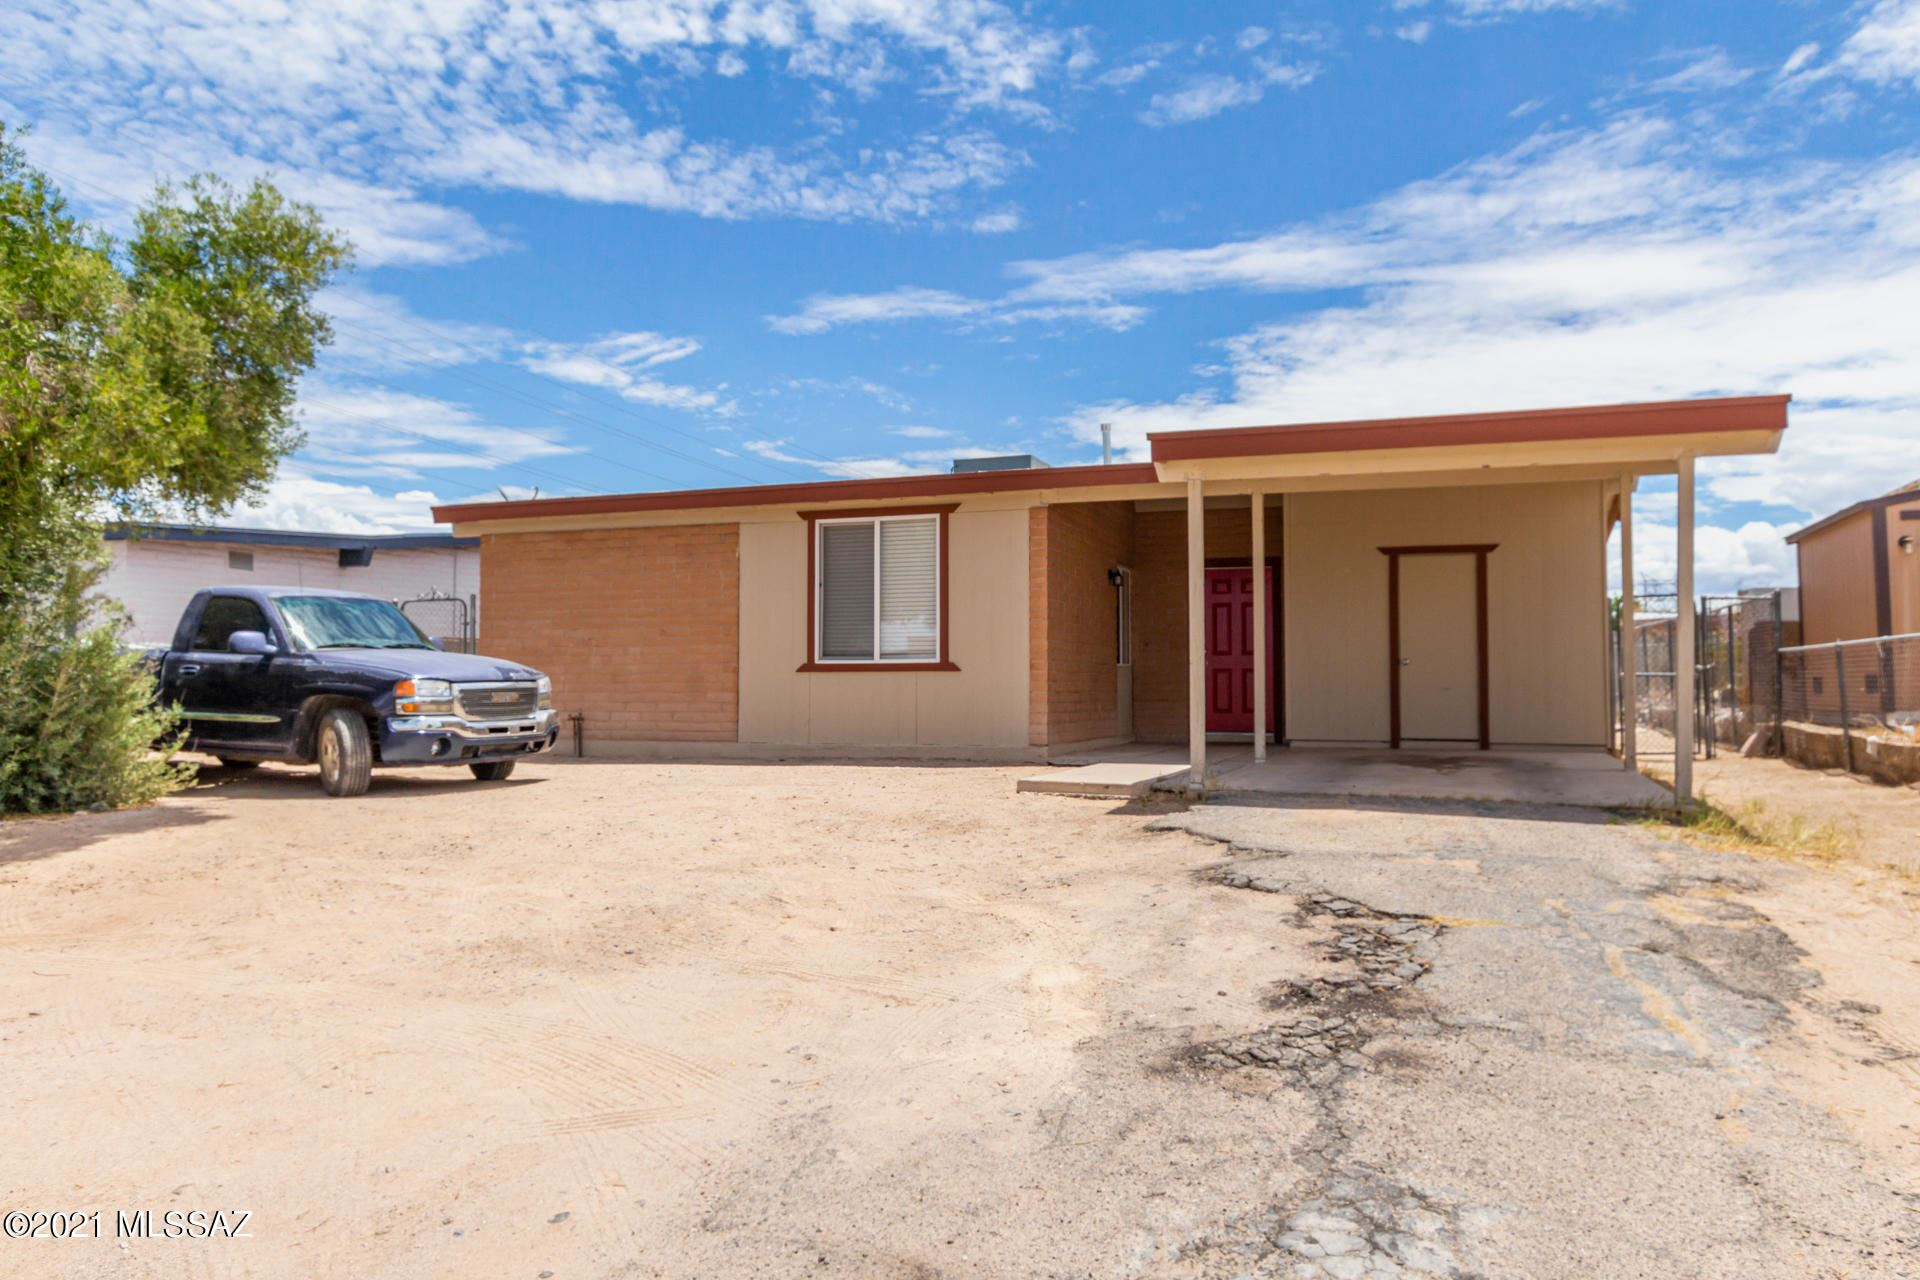 5489 S Santa Clara Avenue, Tucson, AZ 85706 - MLS#: 22117220